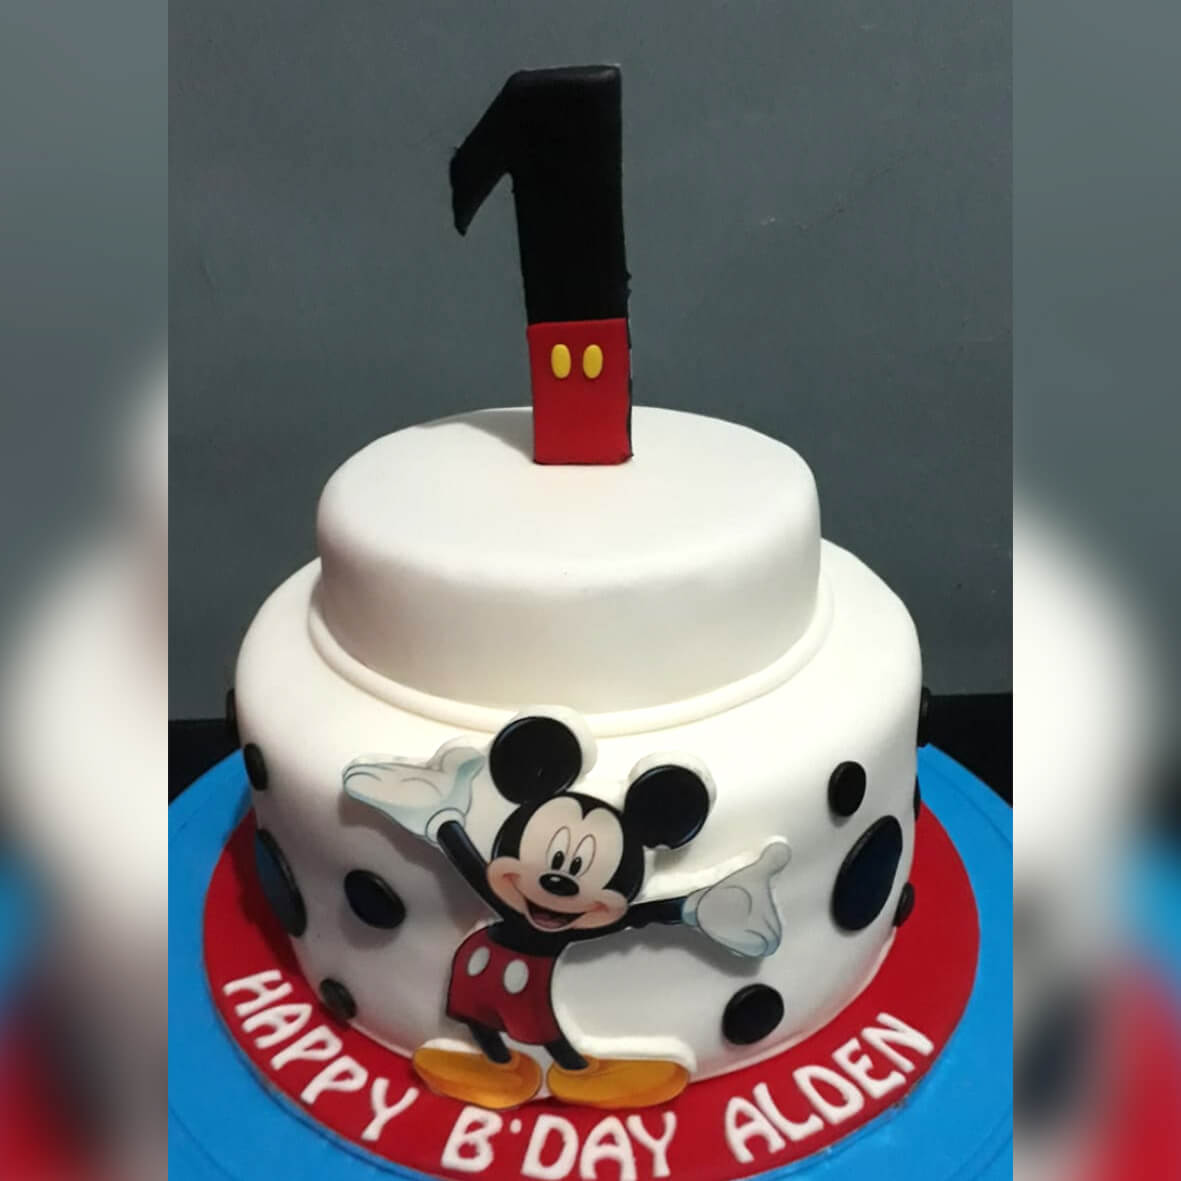 Mickey Cake Bekasi Pesan Online Delivery Indonesia Prestisa